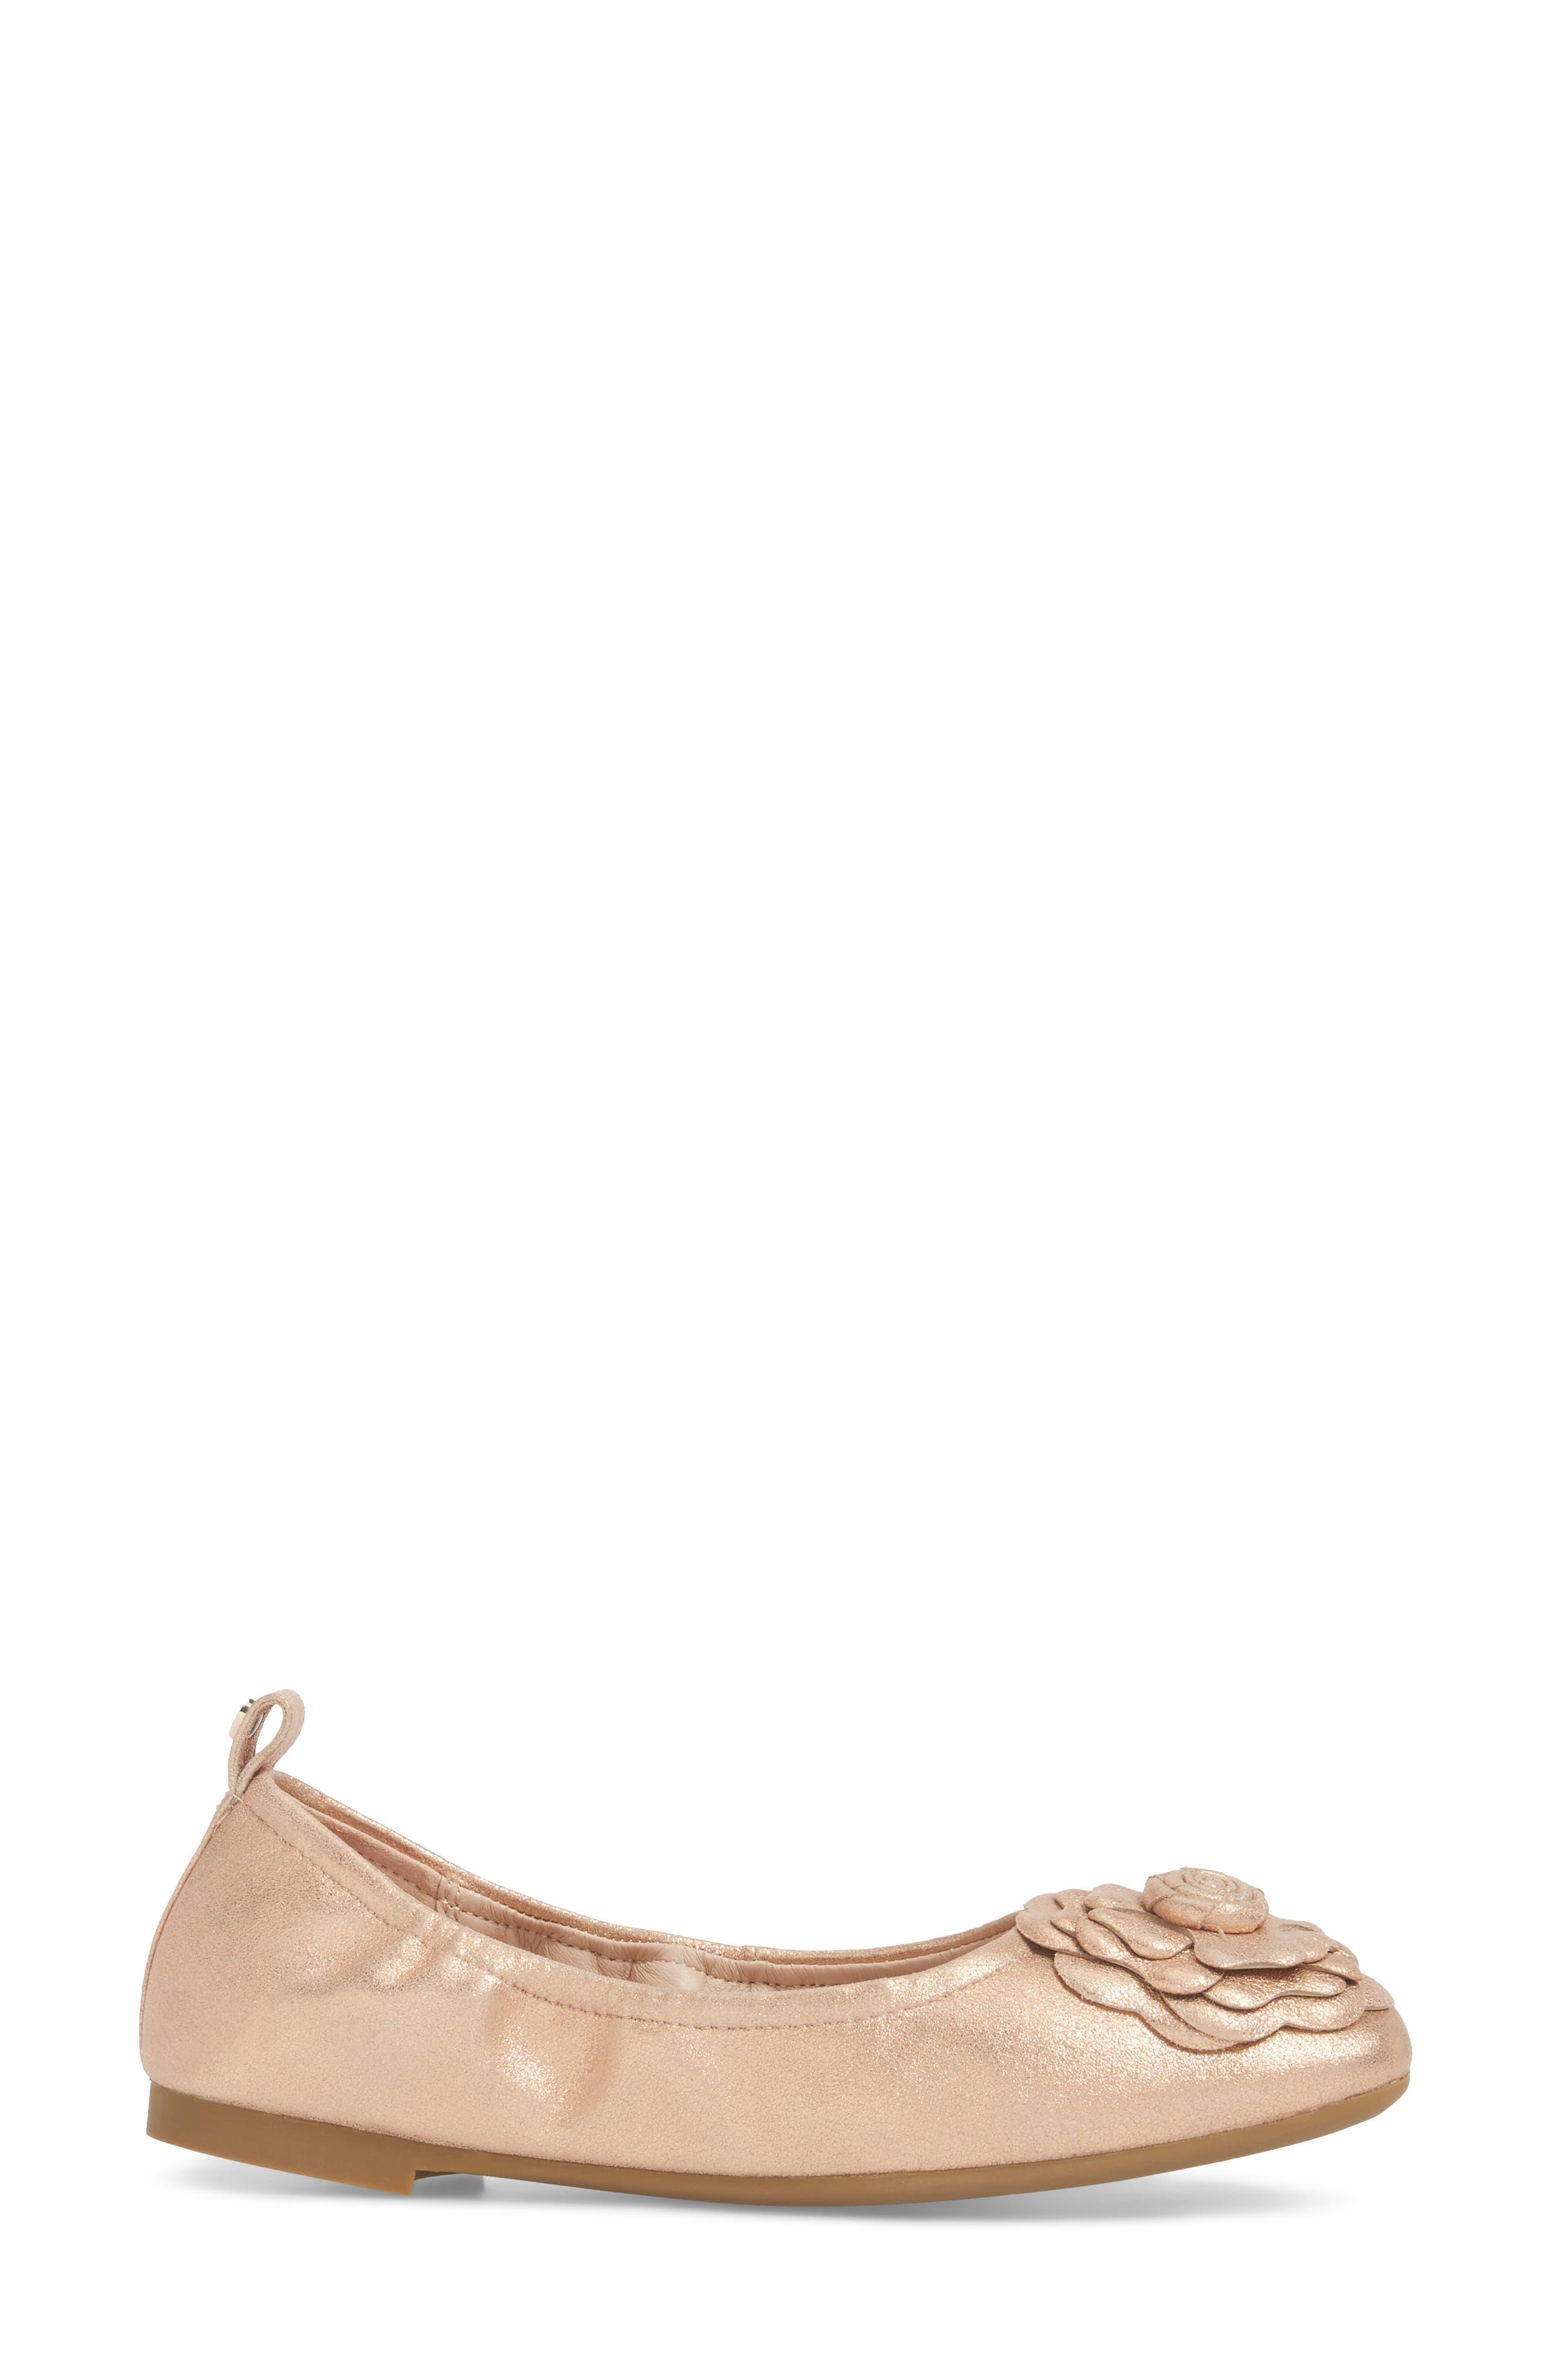 Rosalyn Ballet Flat,                             Alternate thumbnail 3, color,                             Rose Gold Leather